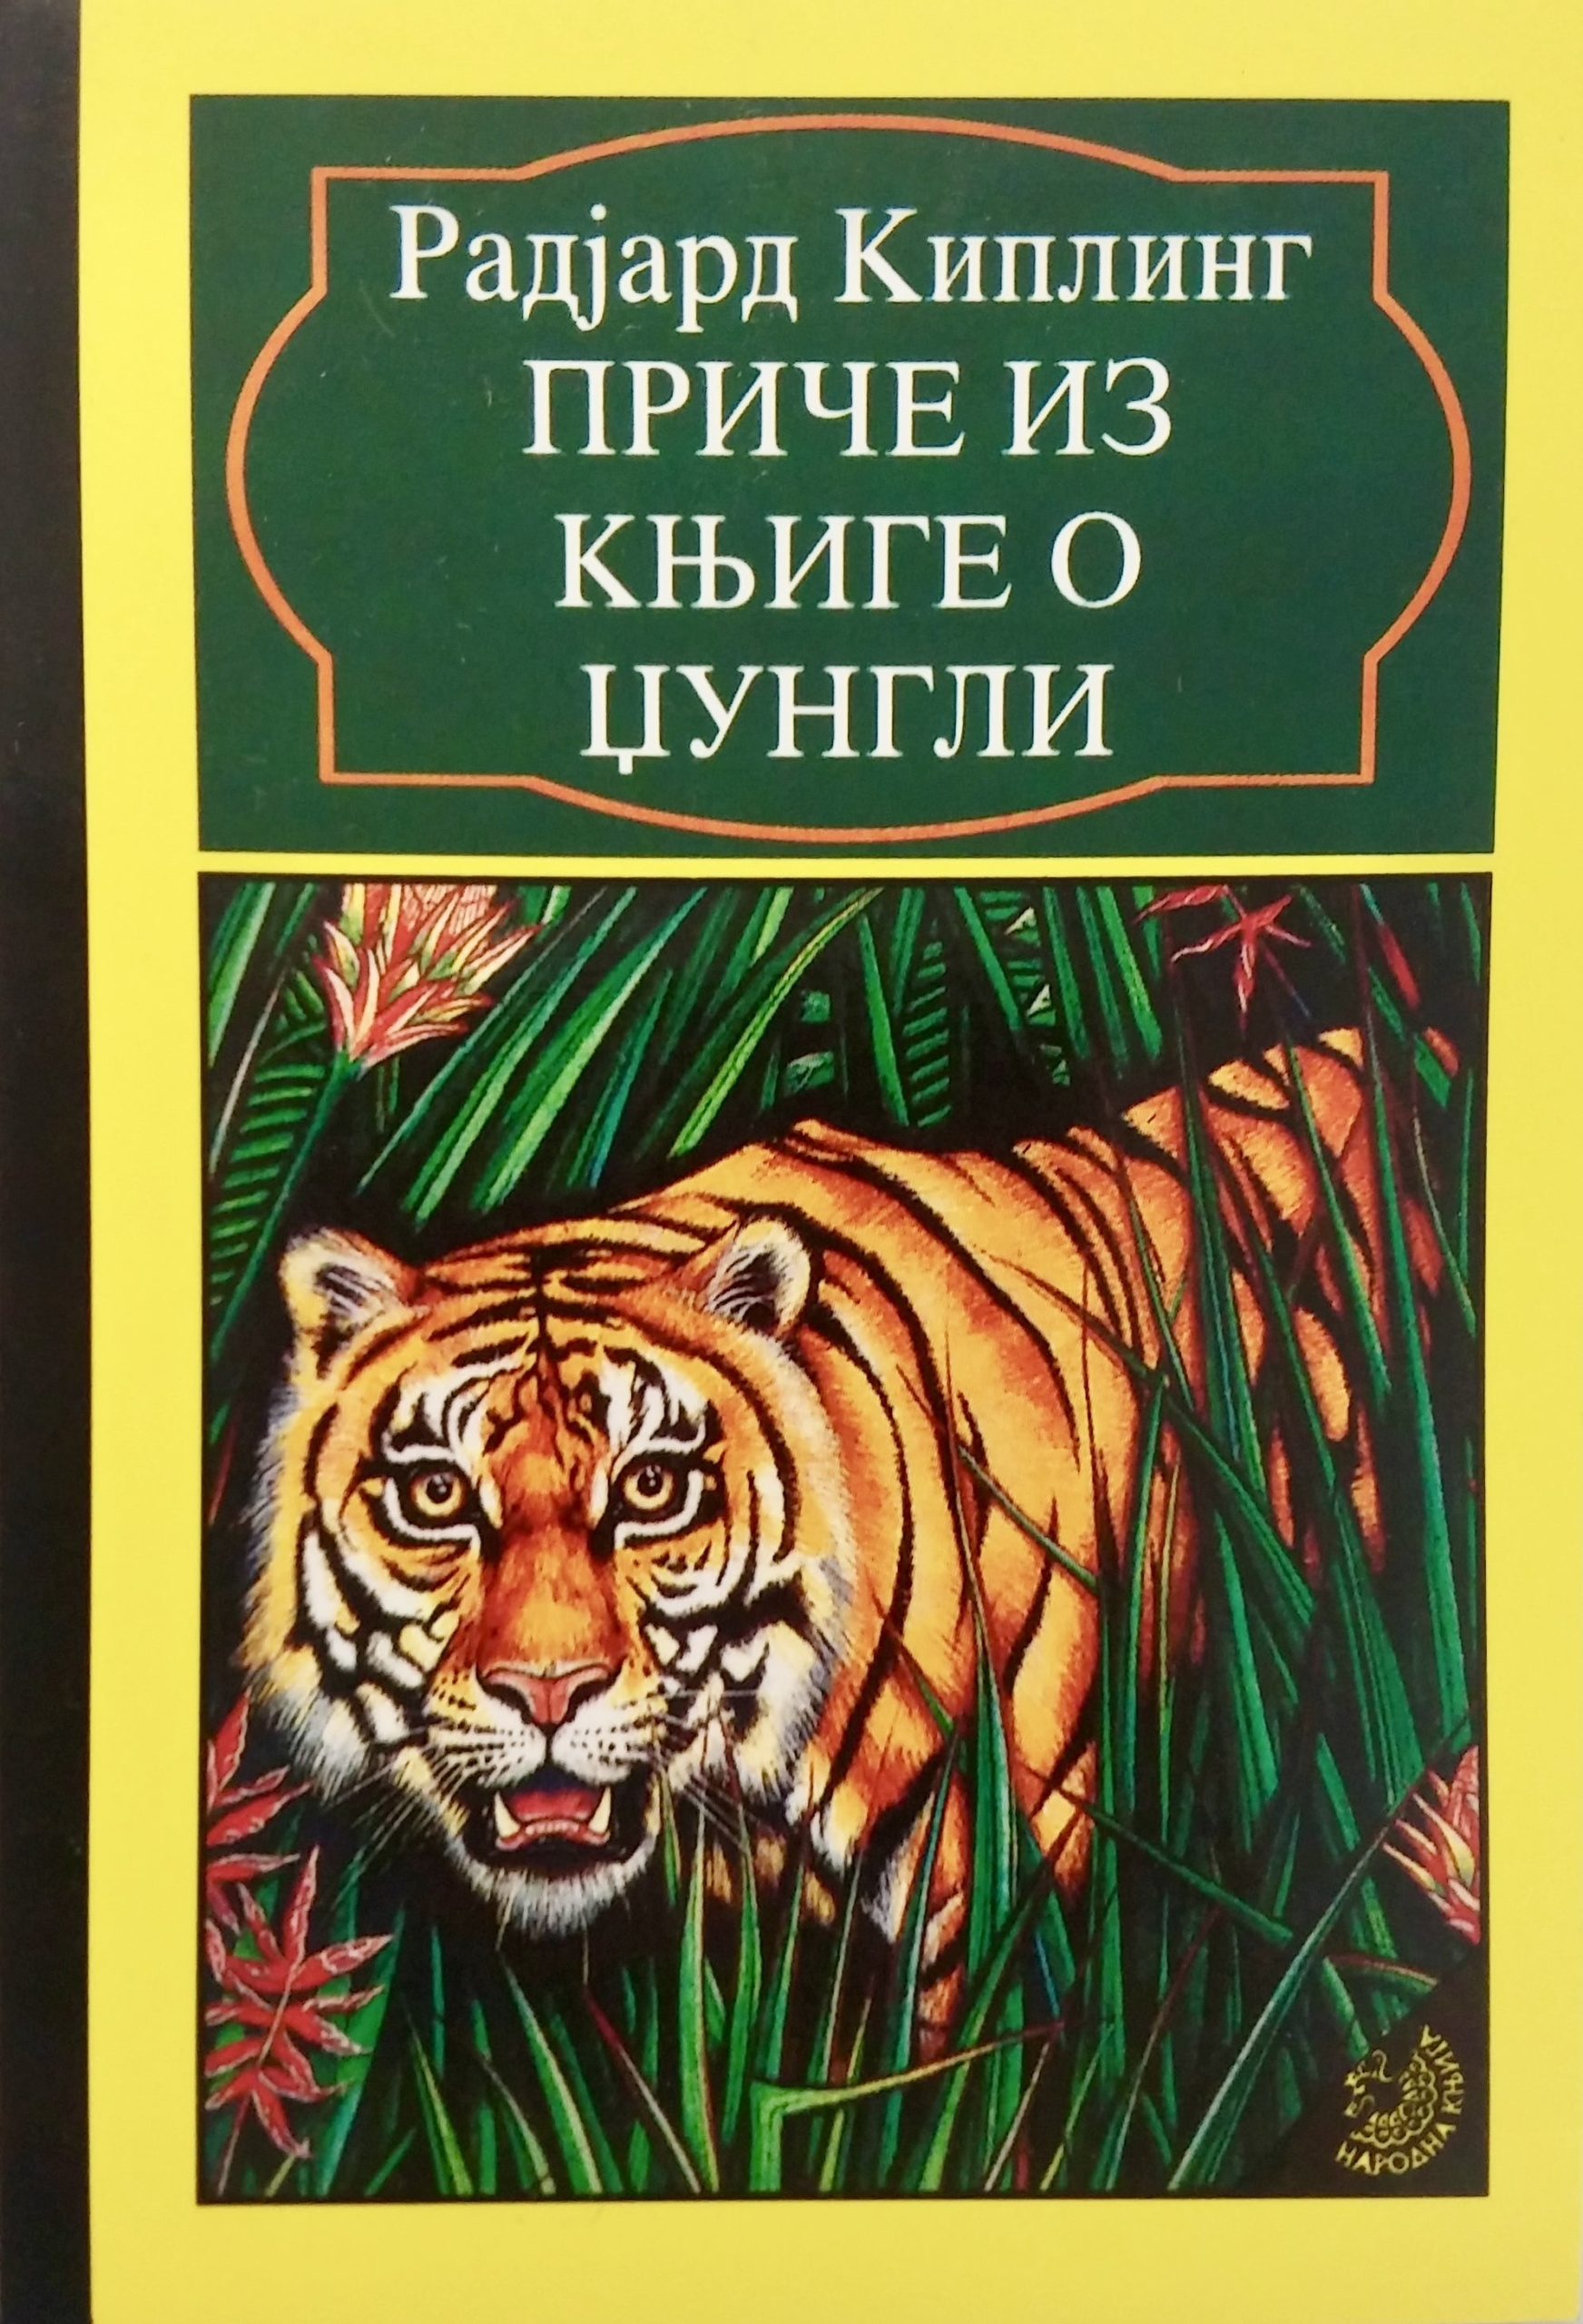 Priče iz knjige o džungli